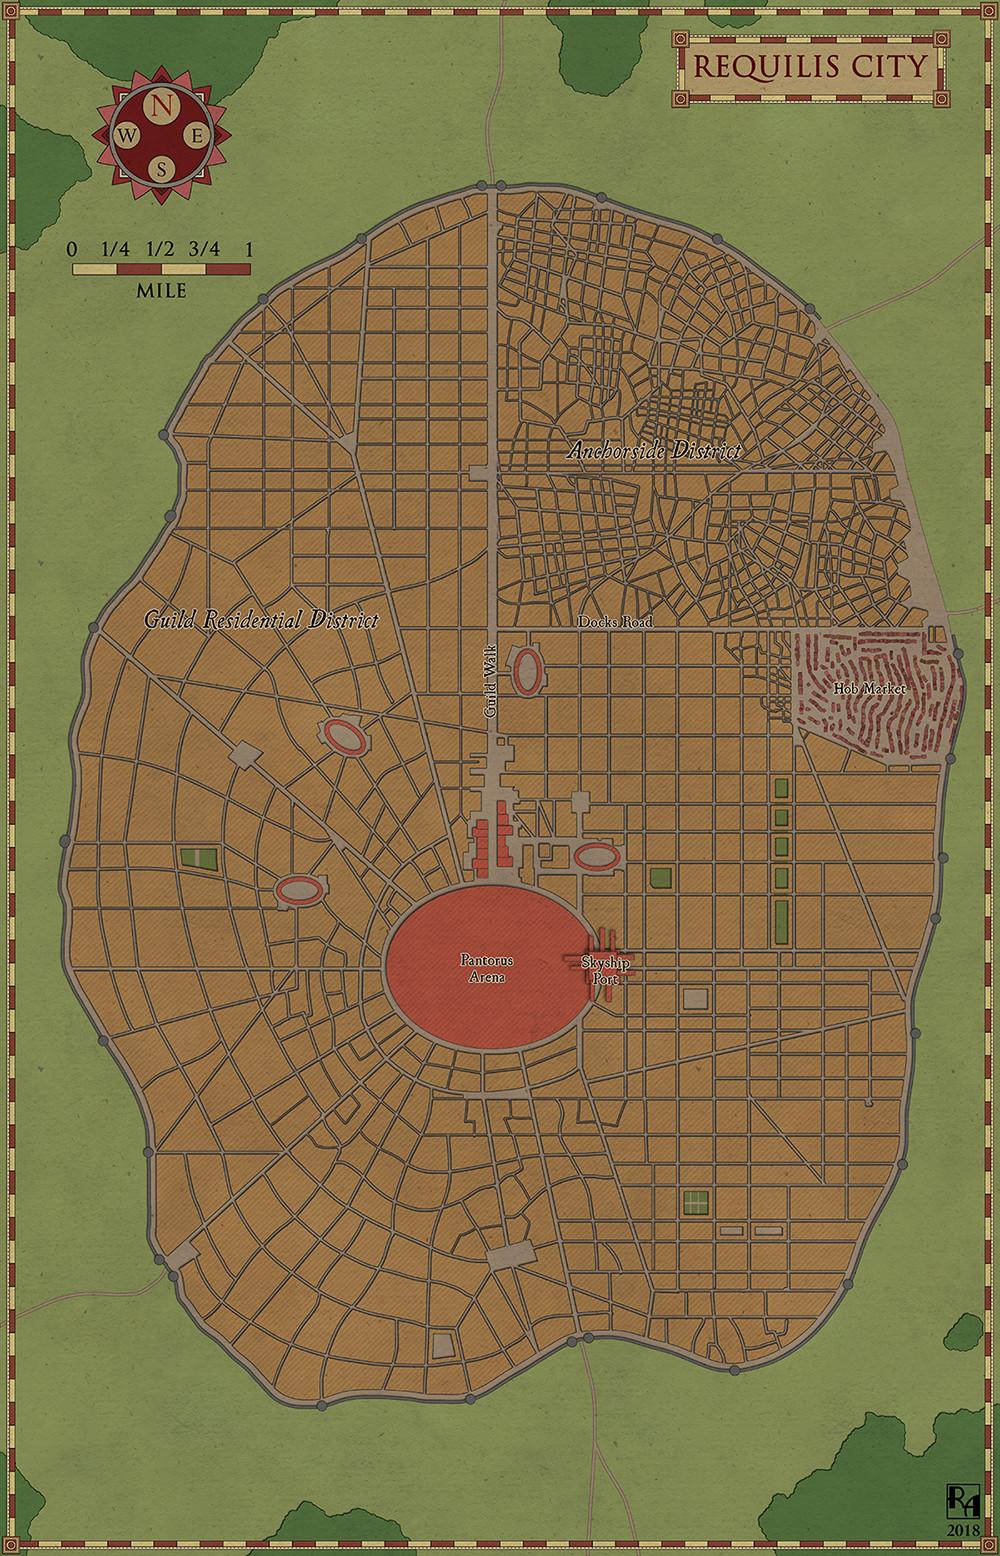 Requilis City